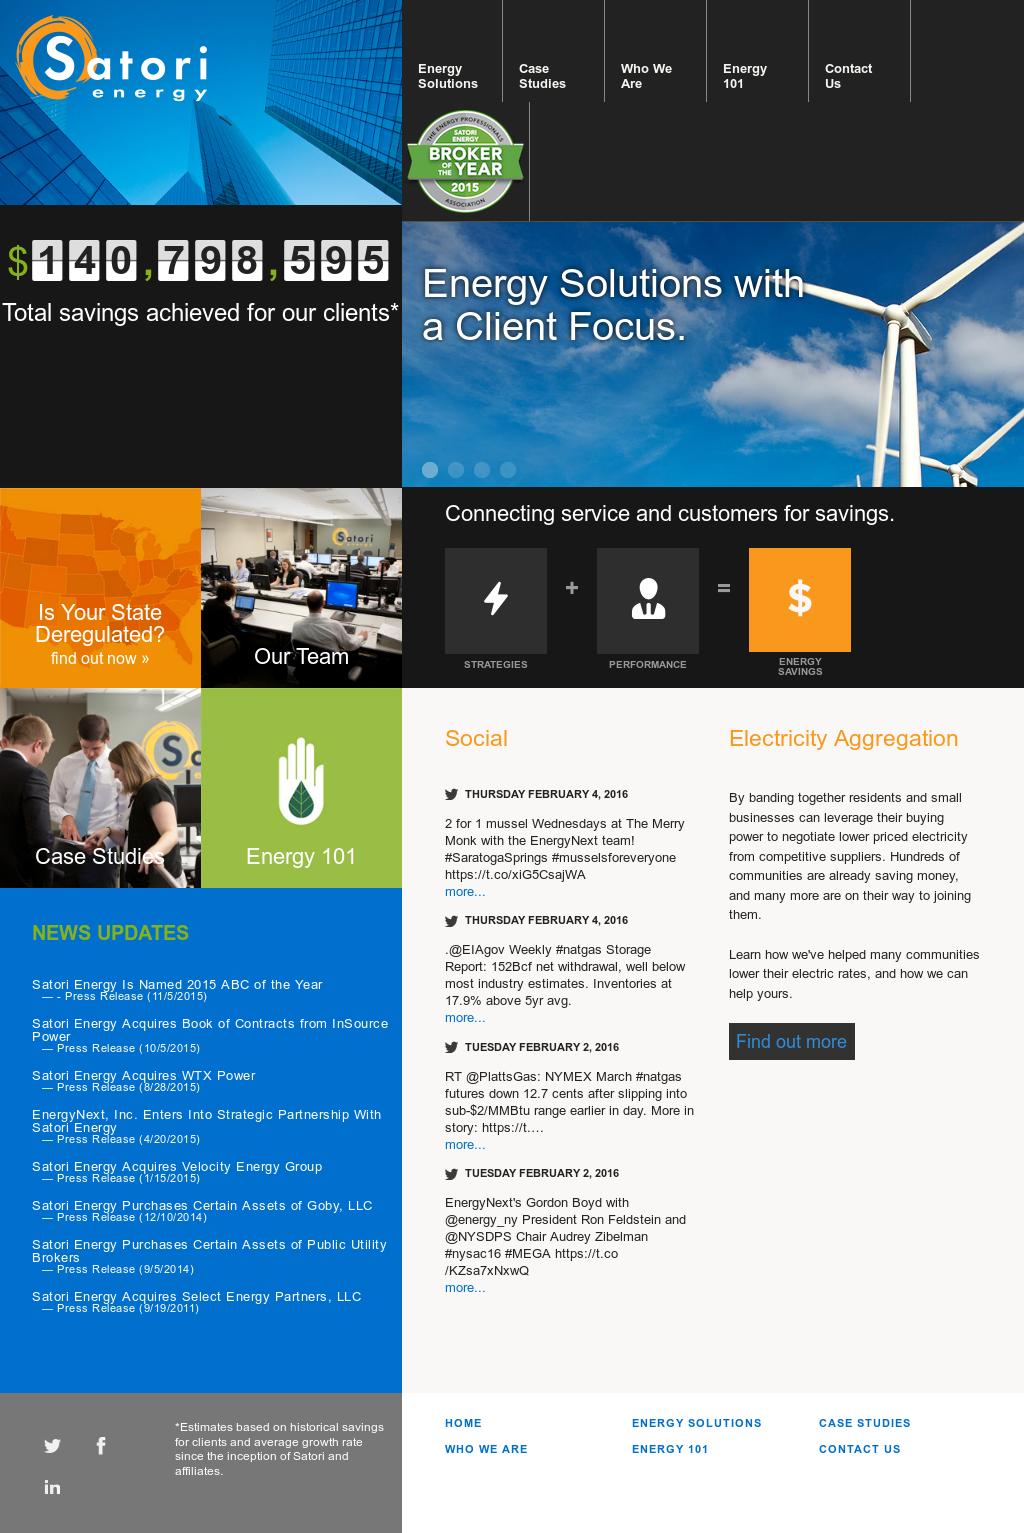 Satori Energy Competitors, Revenue and Employees - Owler